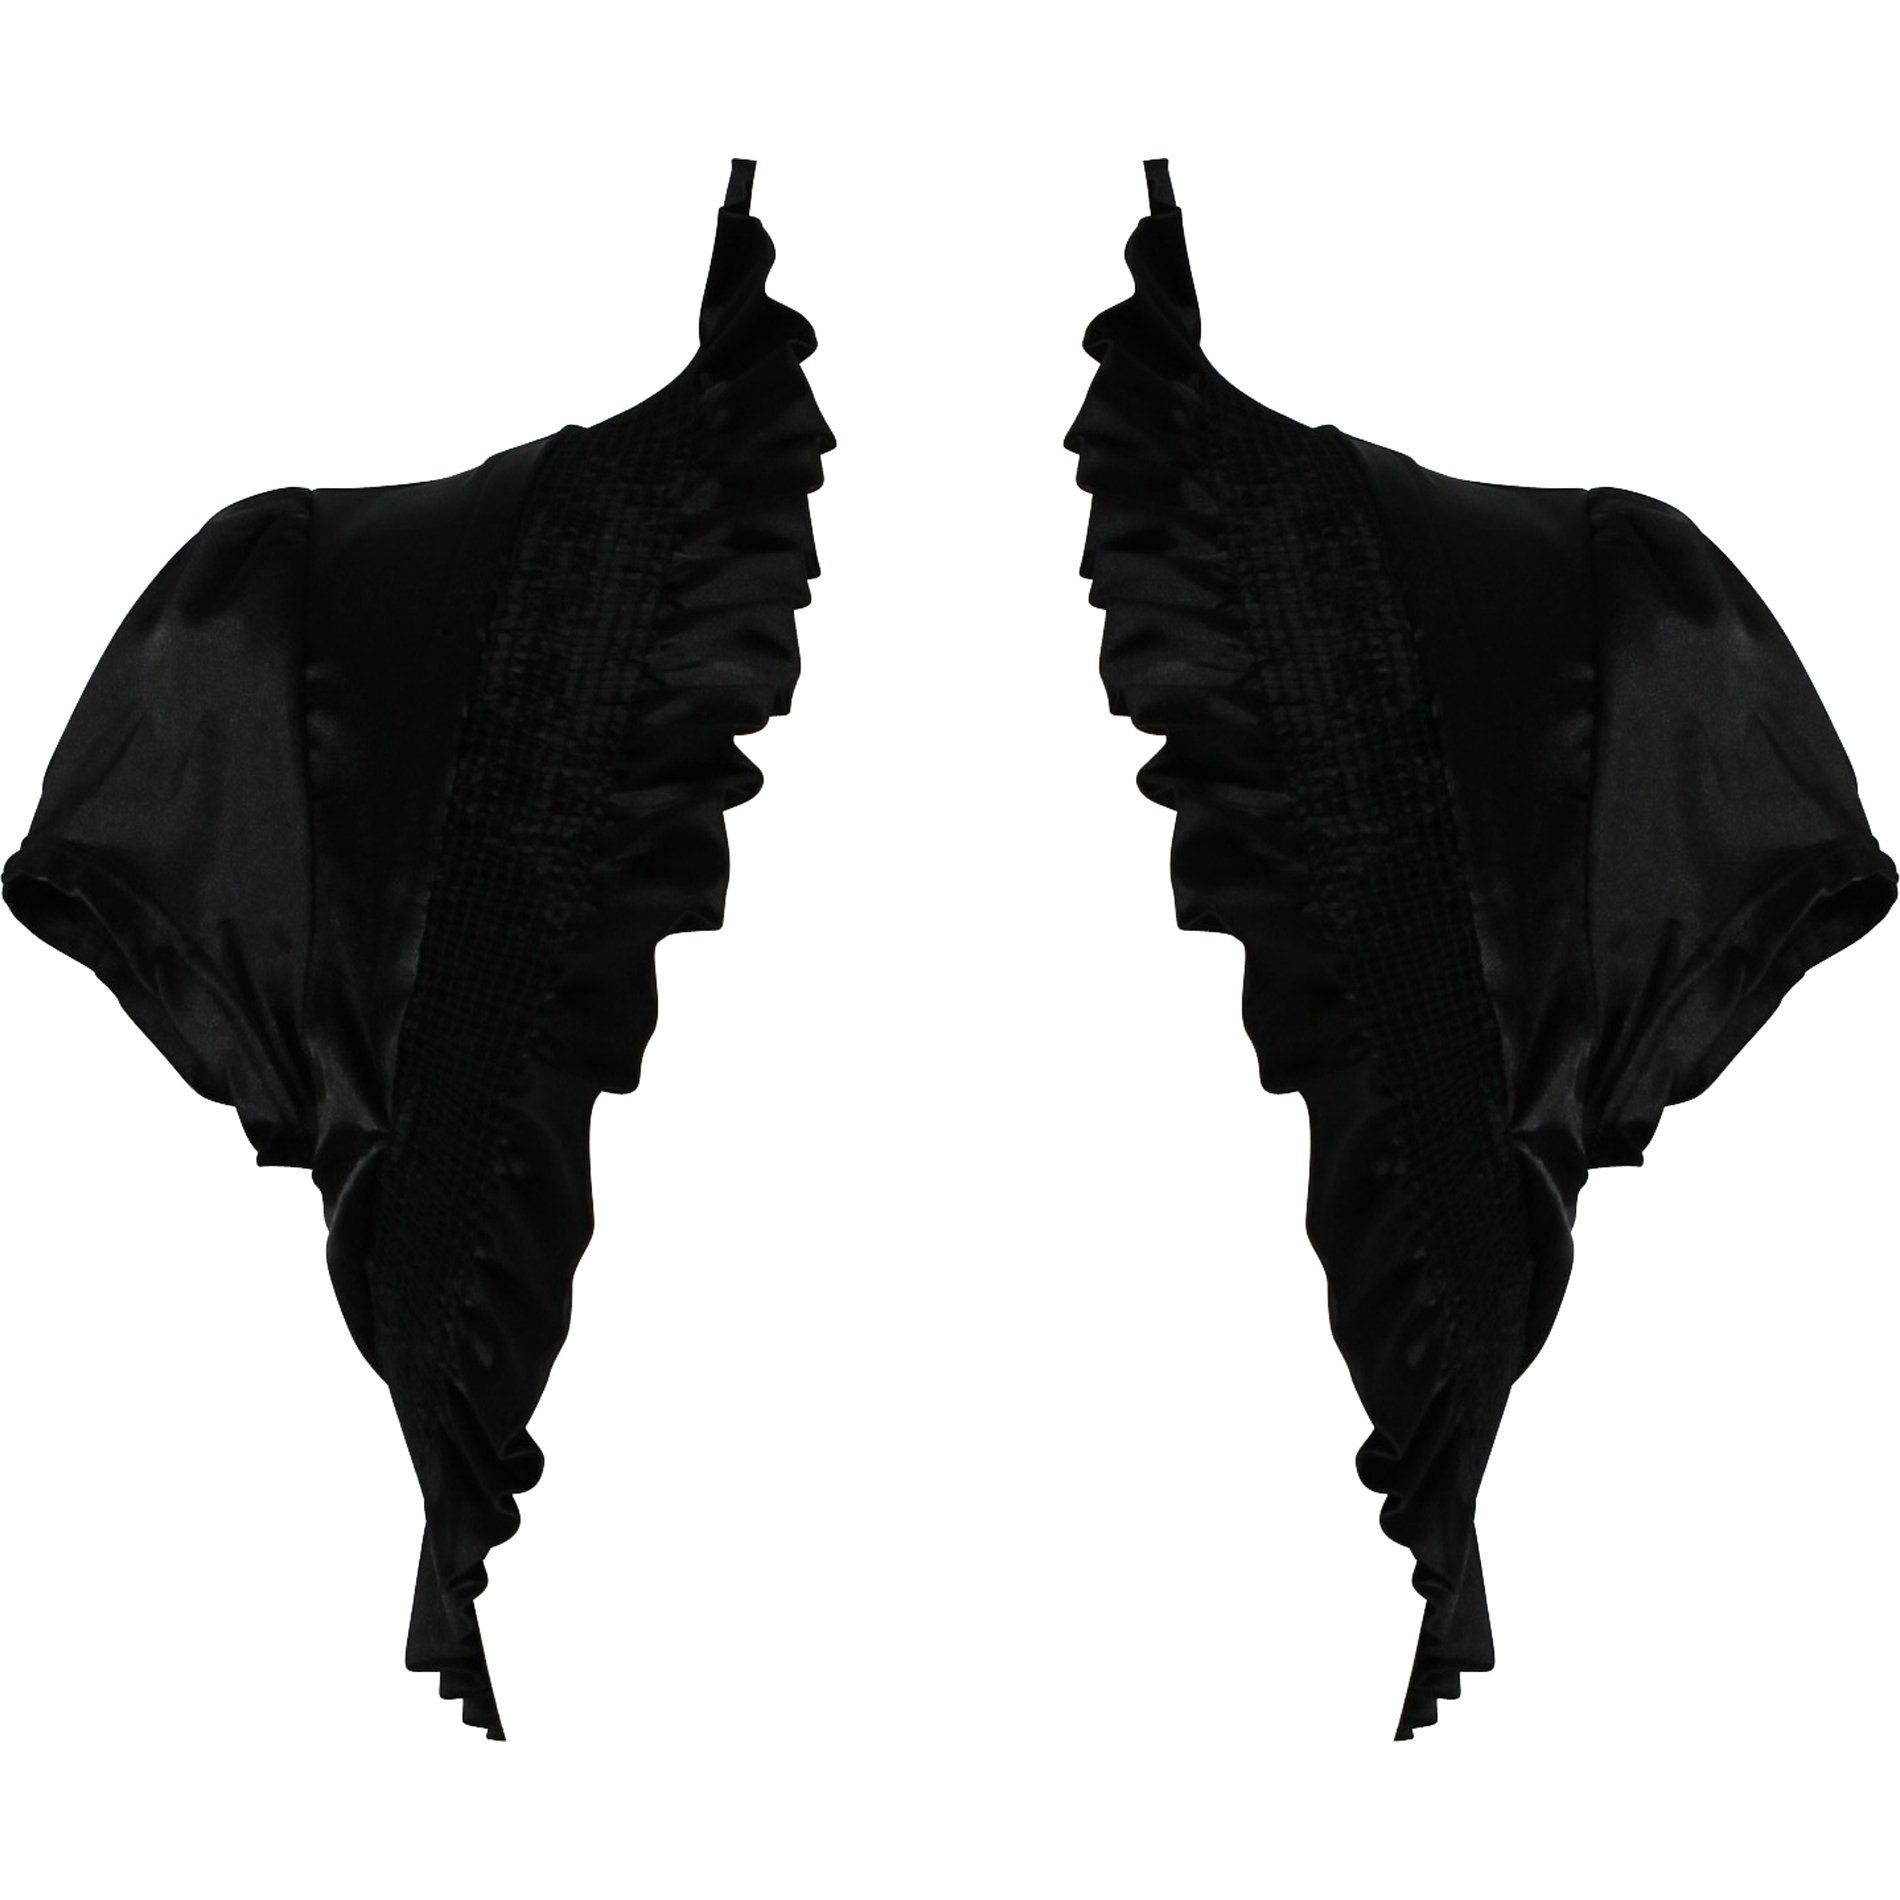 Stretch Satin Bolero Jacket Short Sleeve Cover-up, 2X, Black